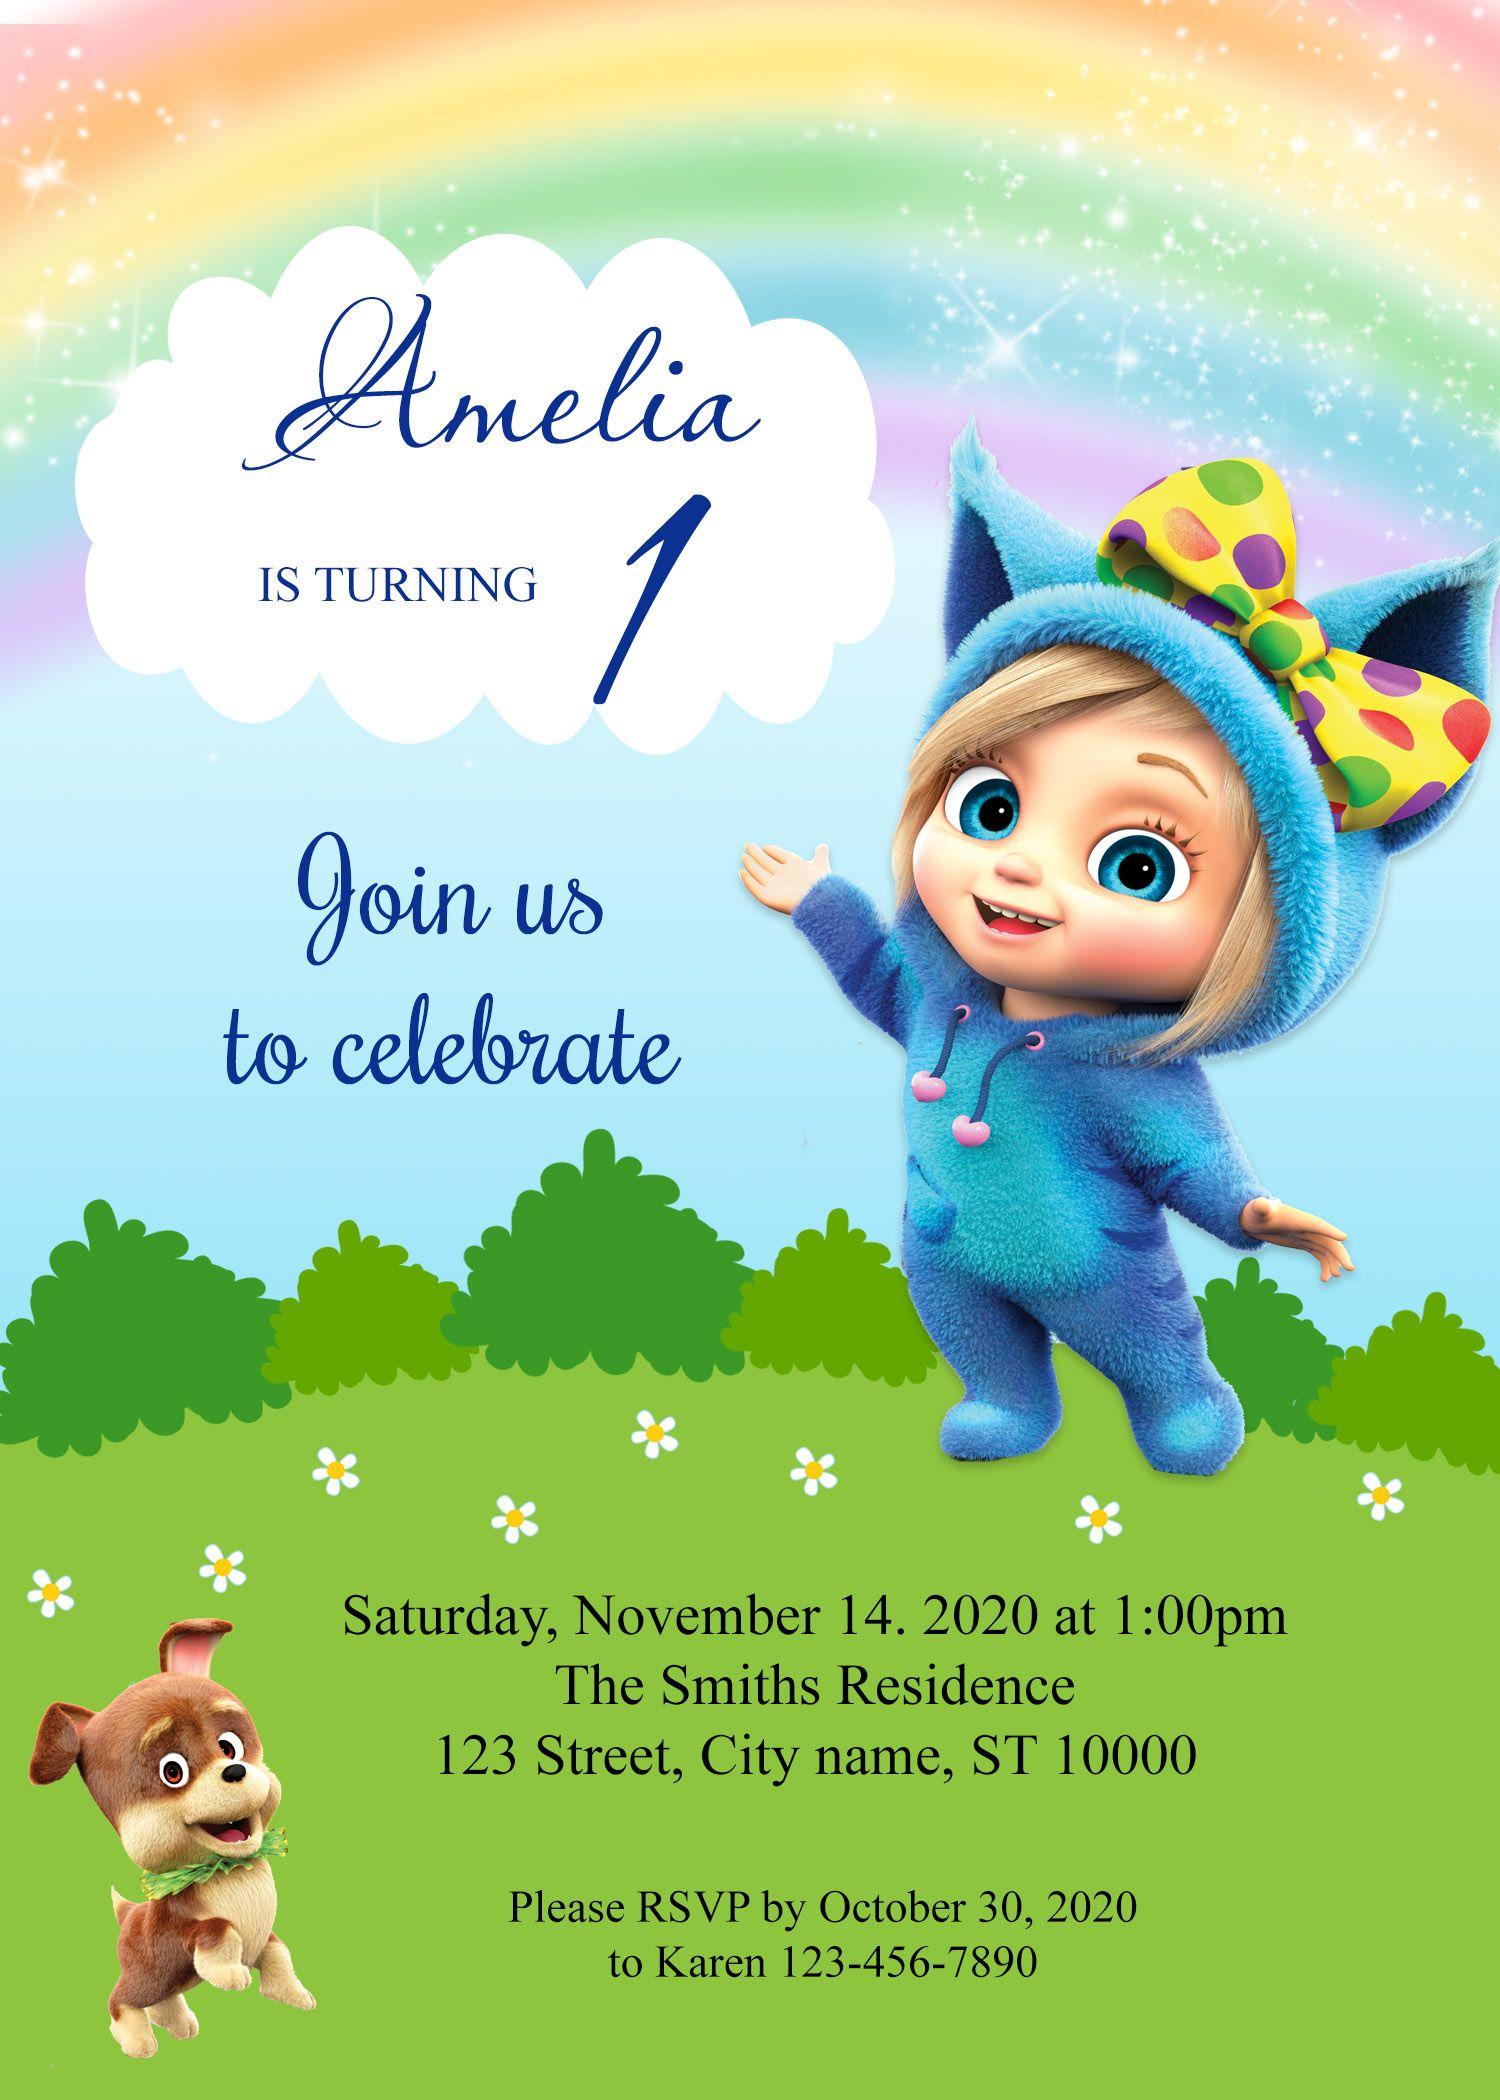 Dave And Ava Birthday Party Invitations Party Invitations Kids Dave And Ava Kids Birthday Party Invitations